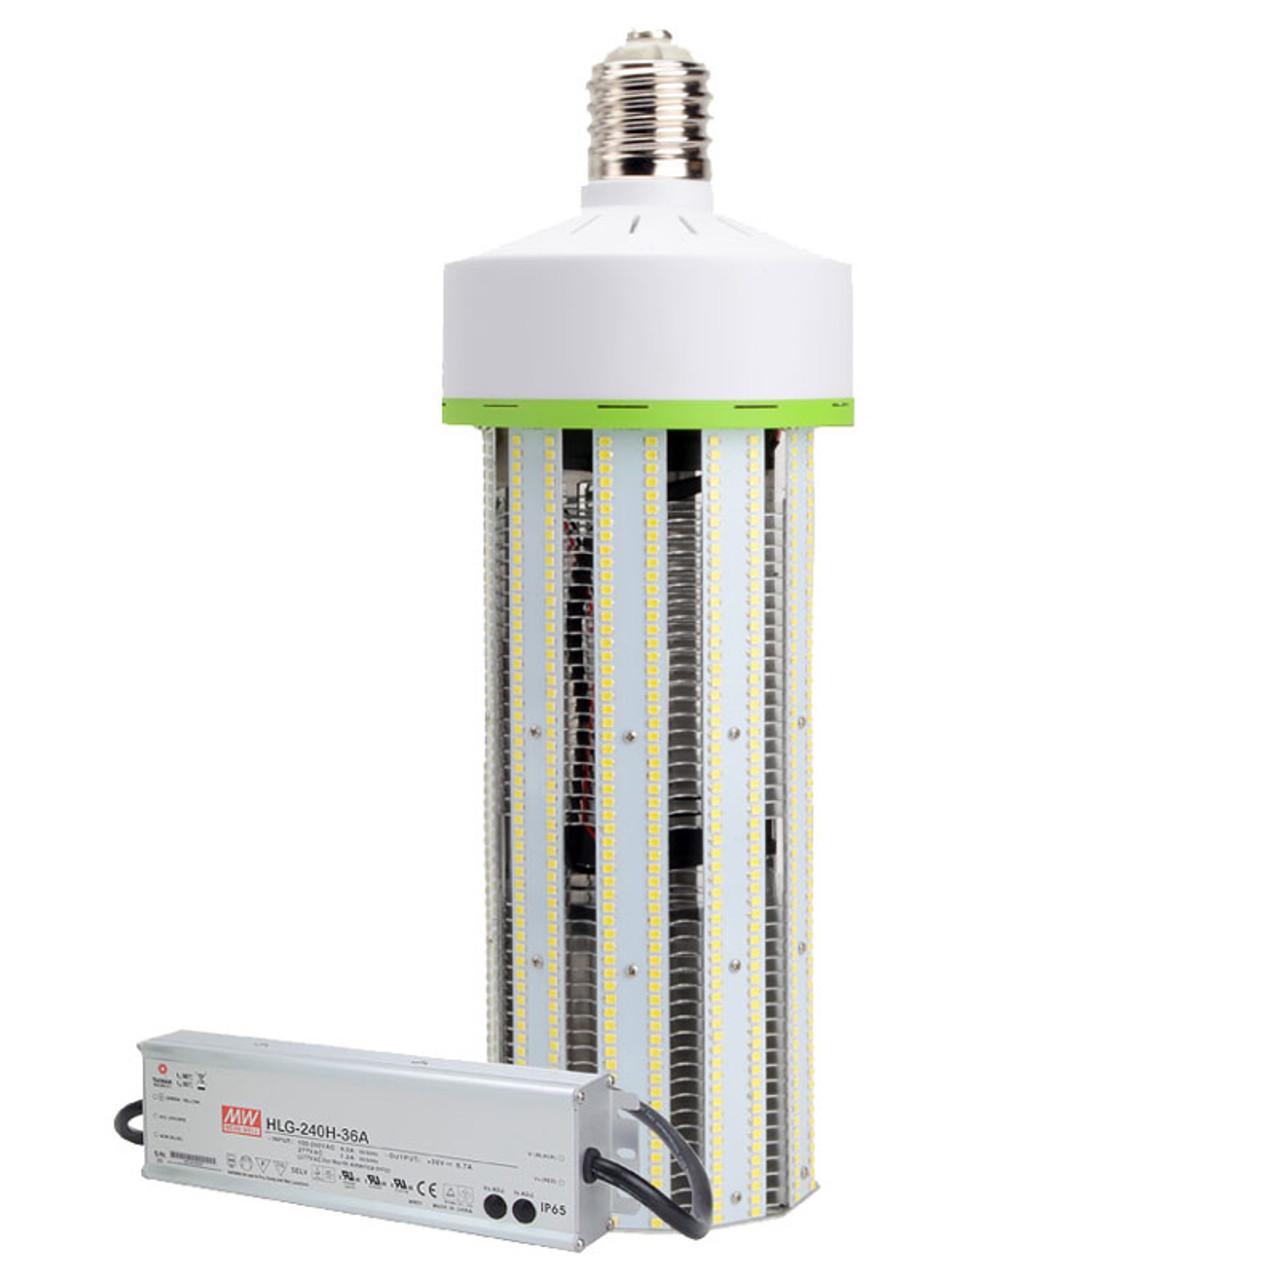 1000 Watt Metal Halide Led Replacement 200 watt led corn bulb, replace 1,000 watt hid in enclosed fixture, 24,000  lumens, cri 80, 50,000 hours, 5 year warranty